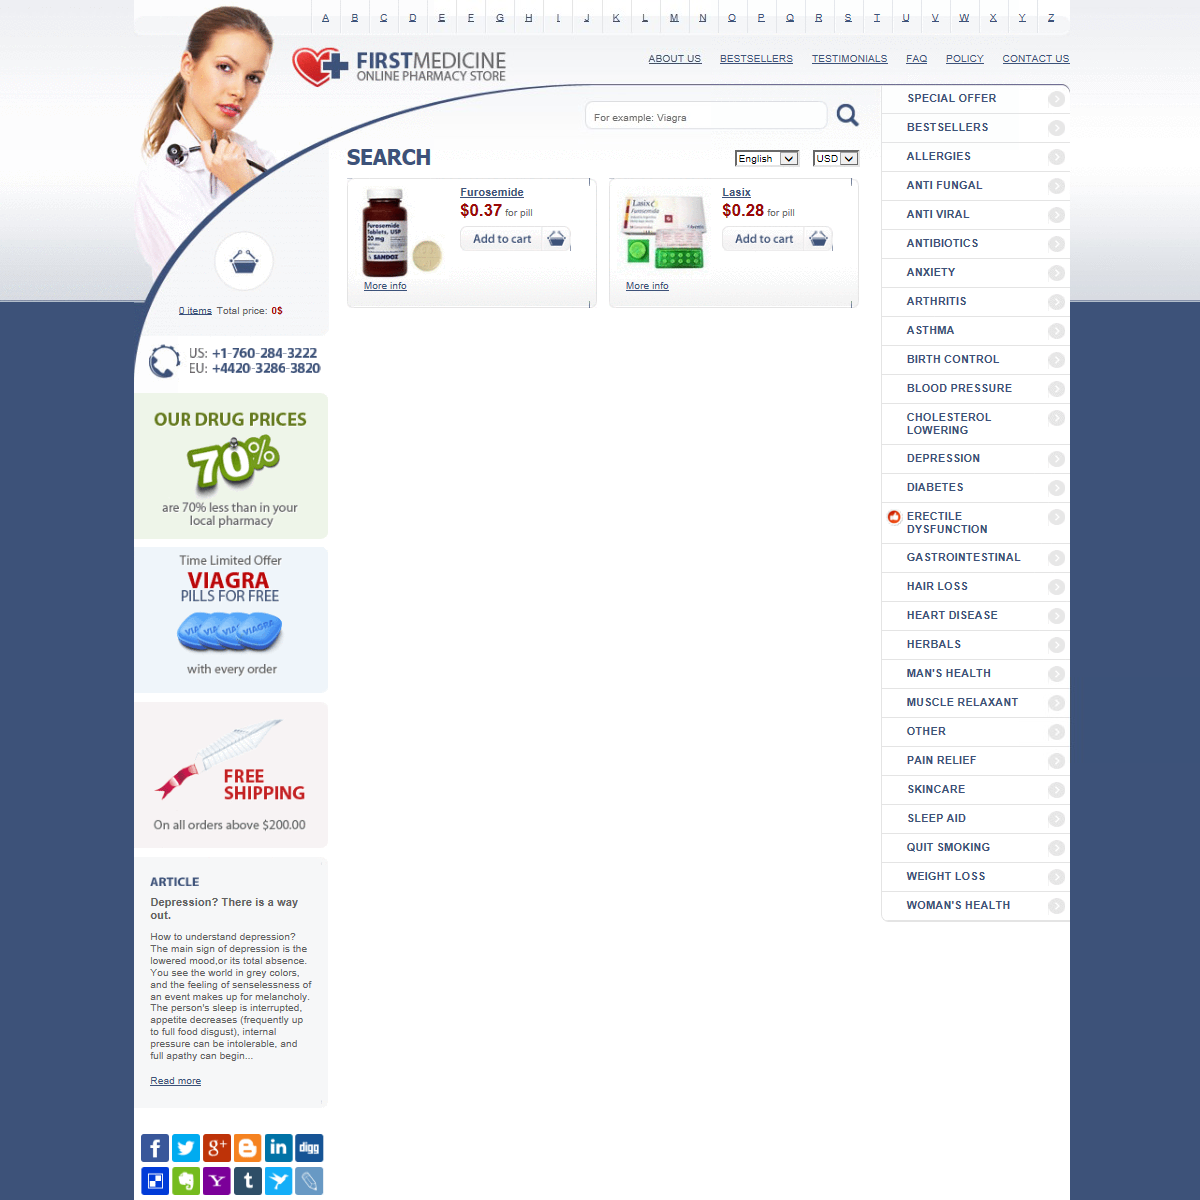 Buy Furosemide 20 Mg Tablets